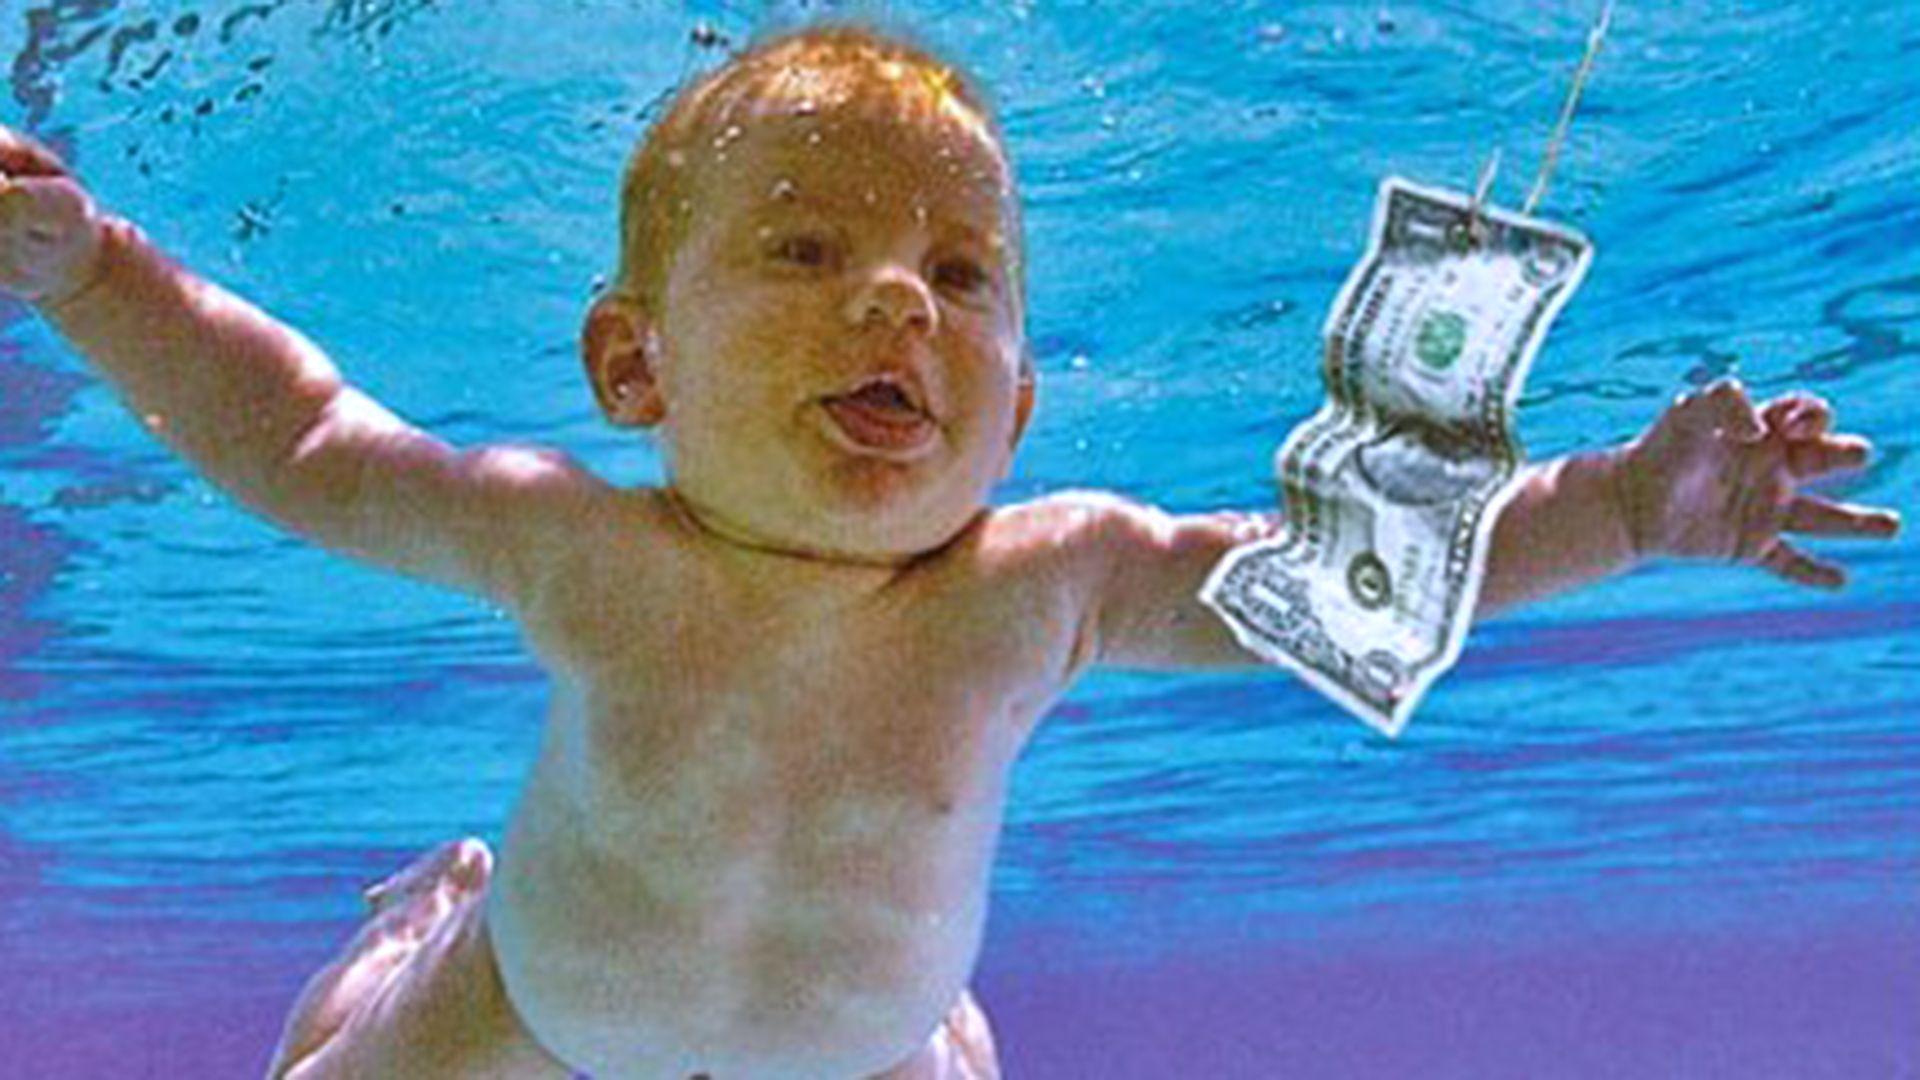 The Nirvana Nevermind album cover baby recreates the